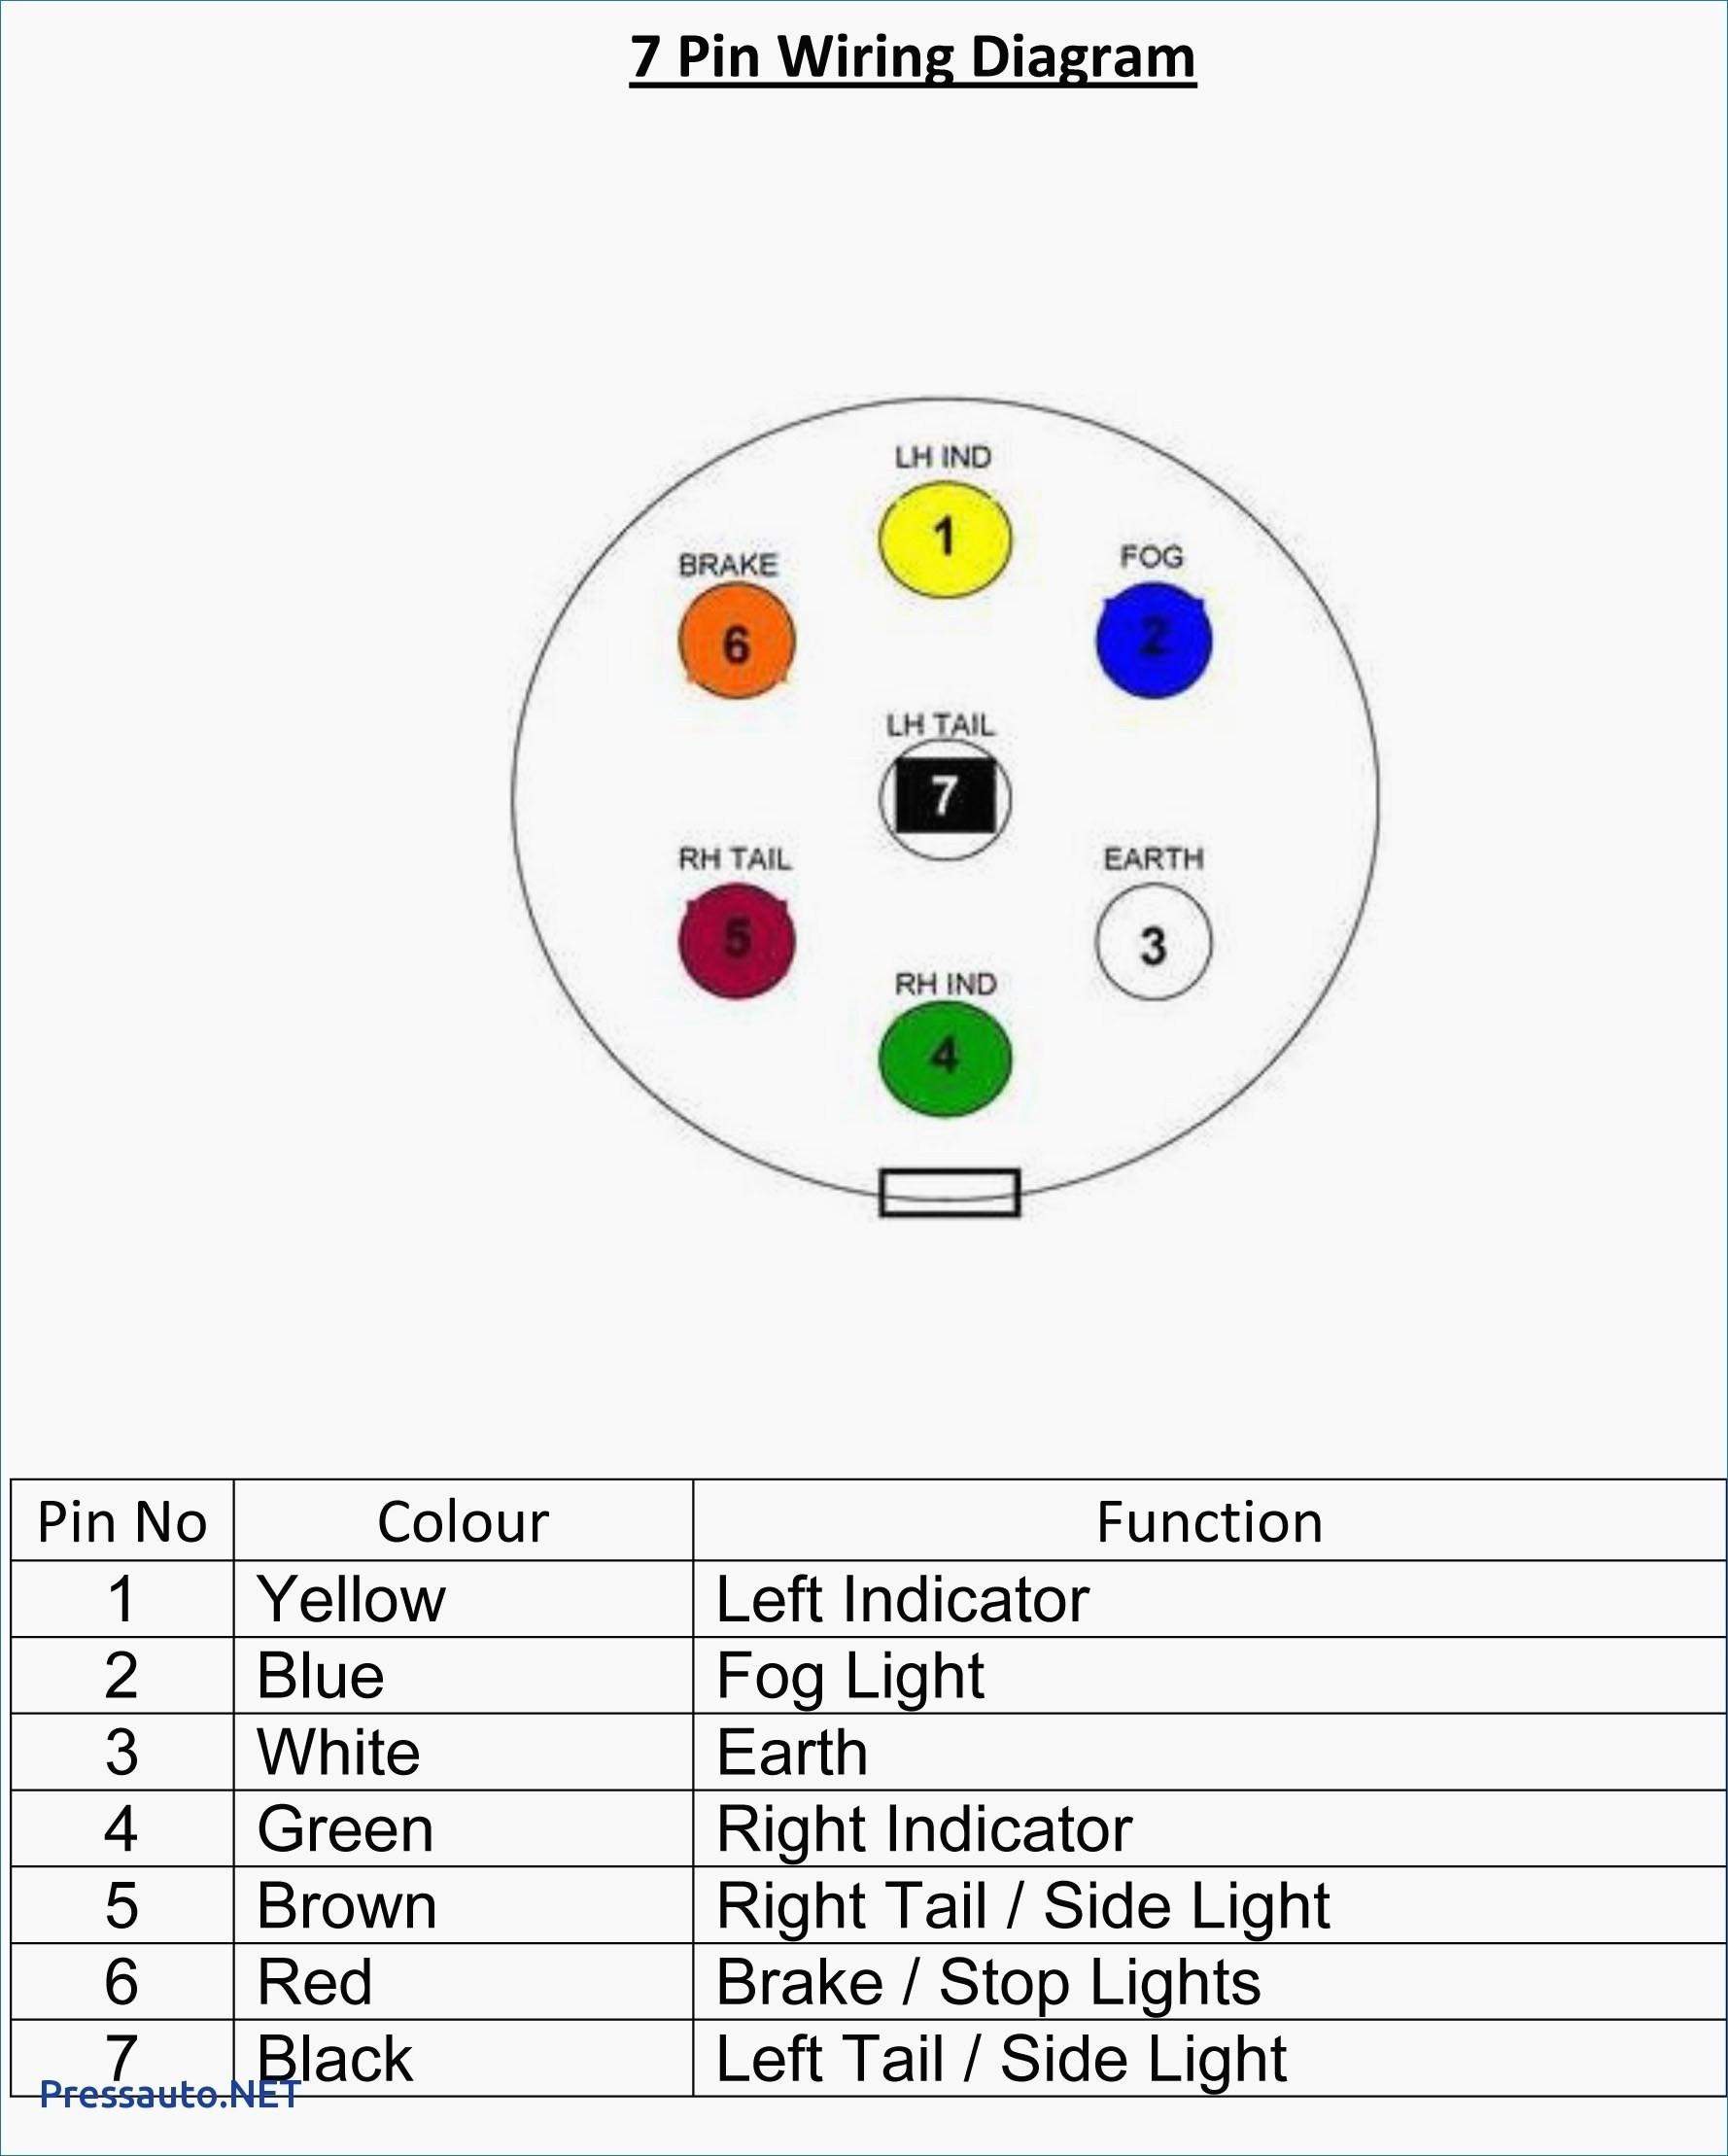 7 Pin Trailer Plug Wiring Gmc - Wiring Diagram Data - Rv Plug Wiring Diagram